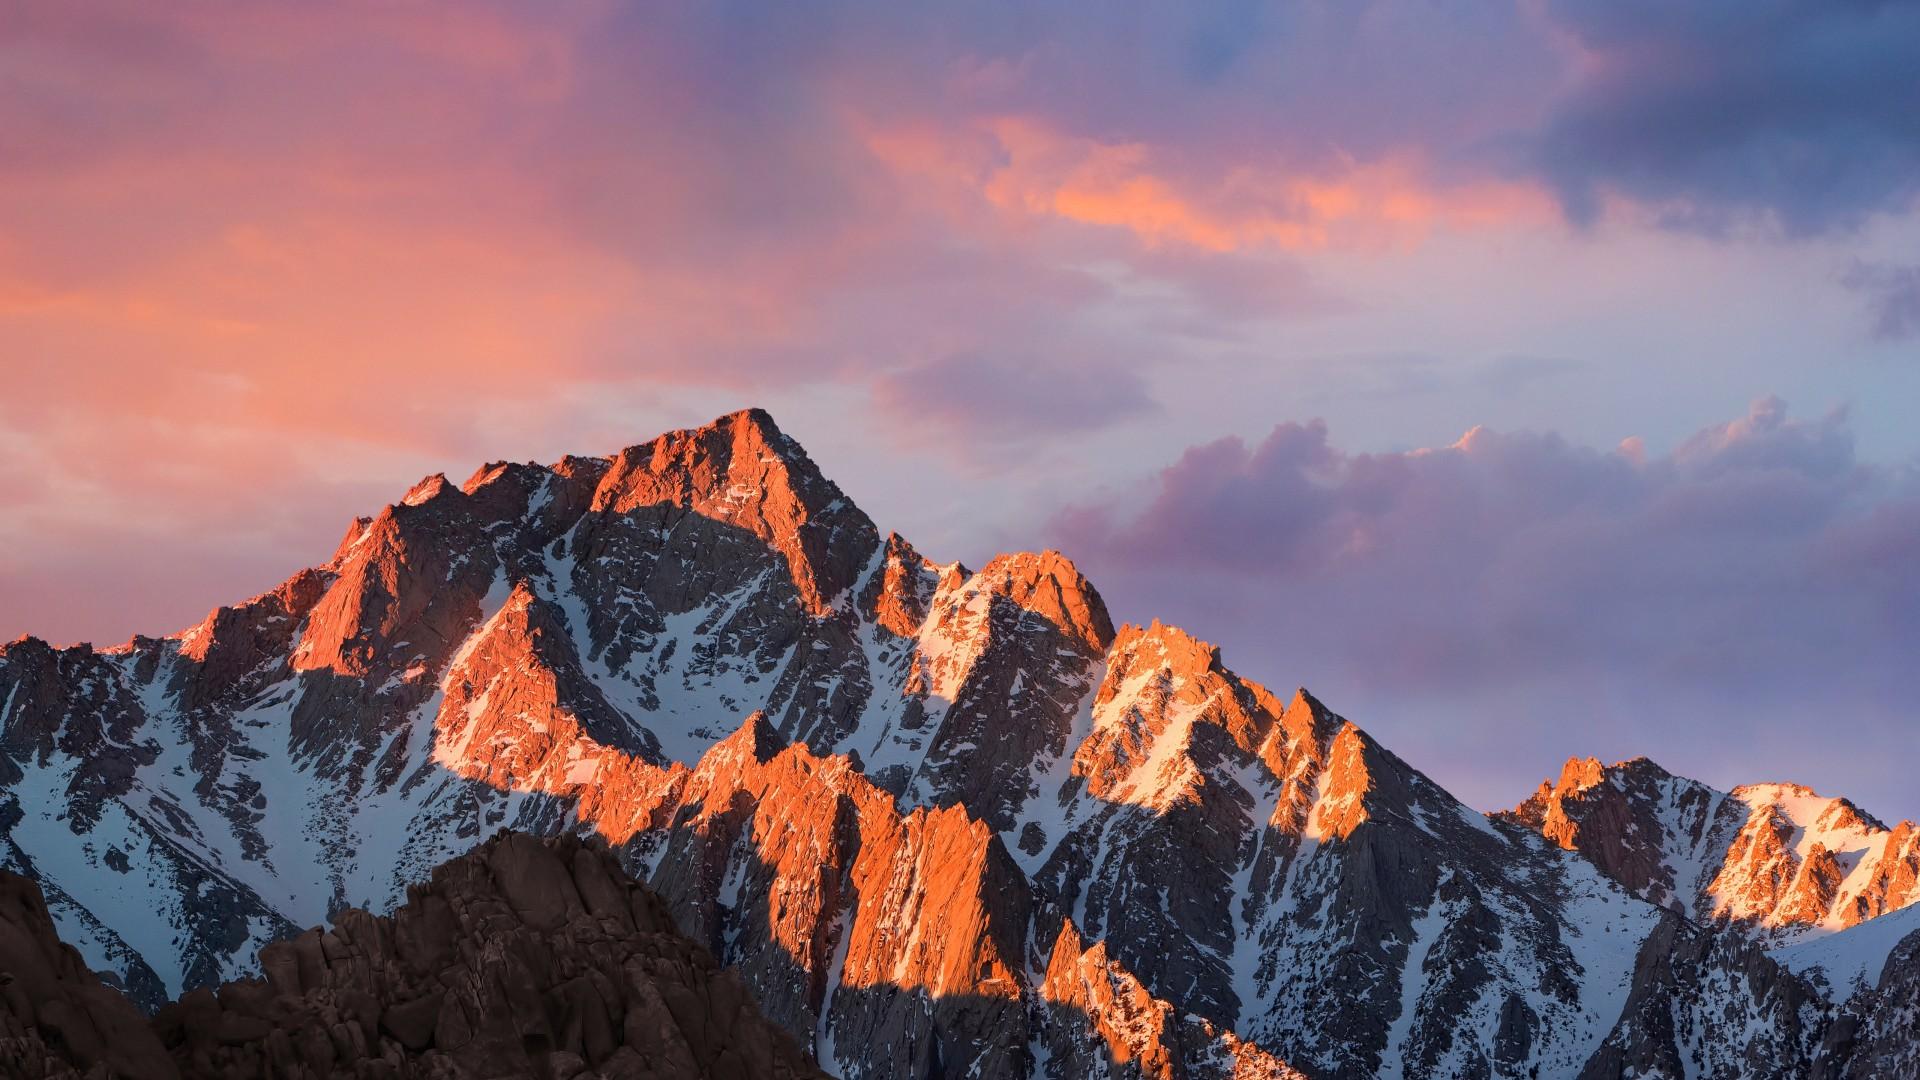 Wallpaper Mountains Macos 4k 5k Sierra Sky Android Wallpaper